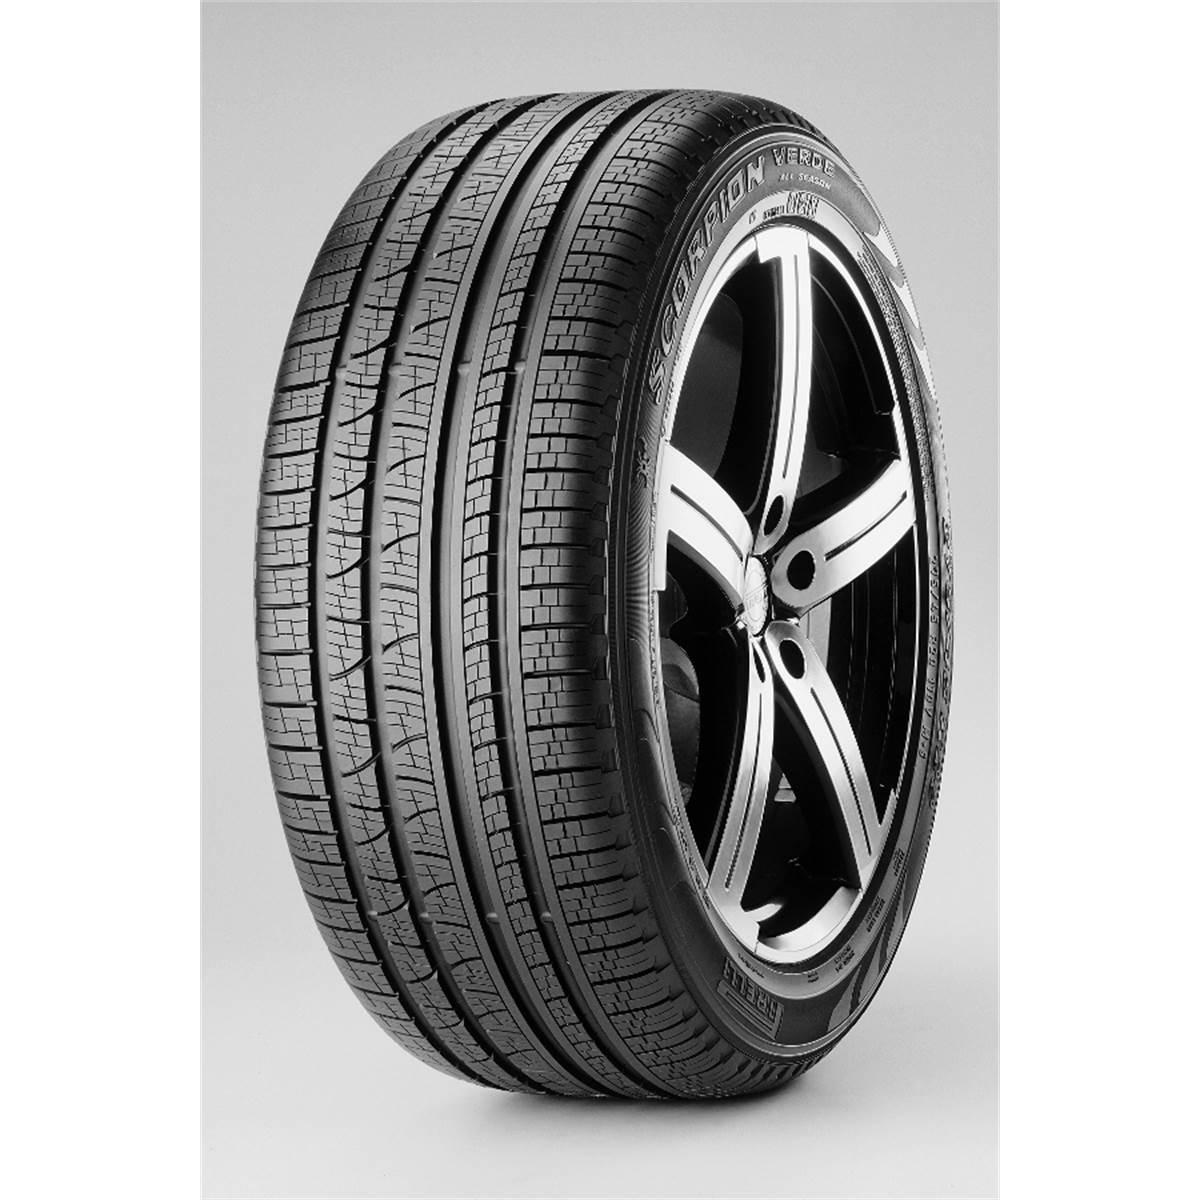 Pneu Pirelli 165/65R15 81T Cinturato P1 Verde